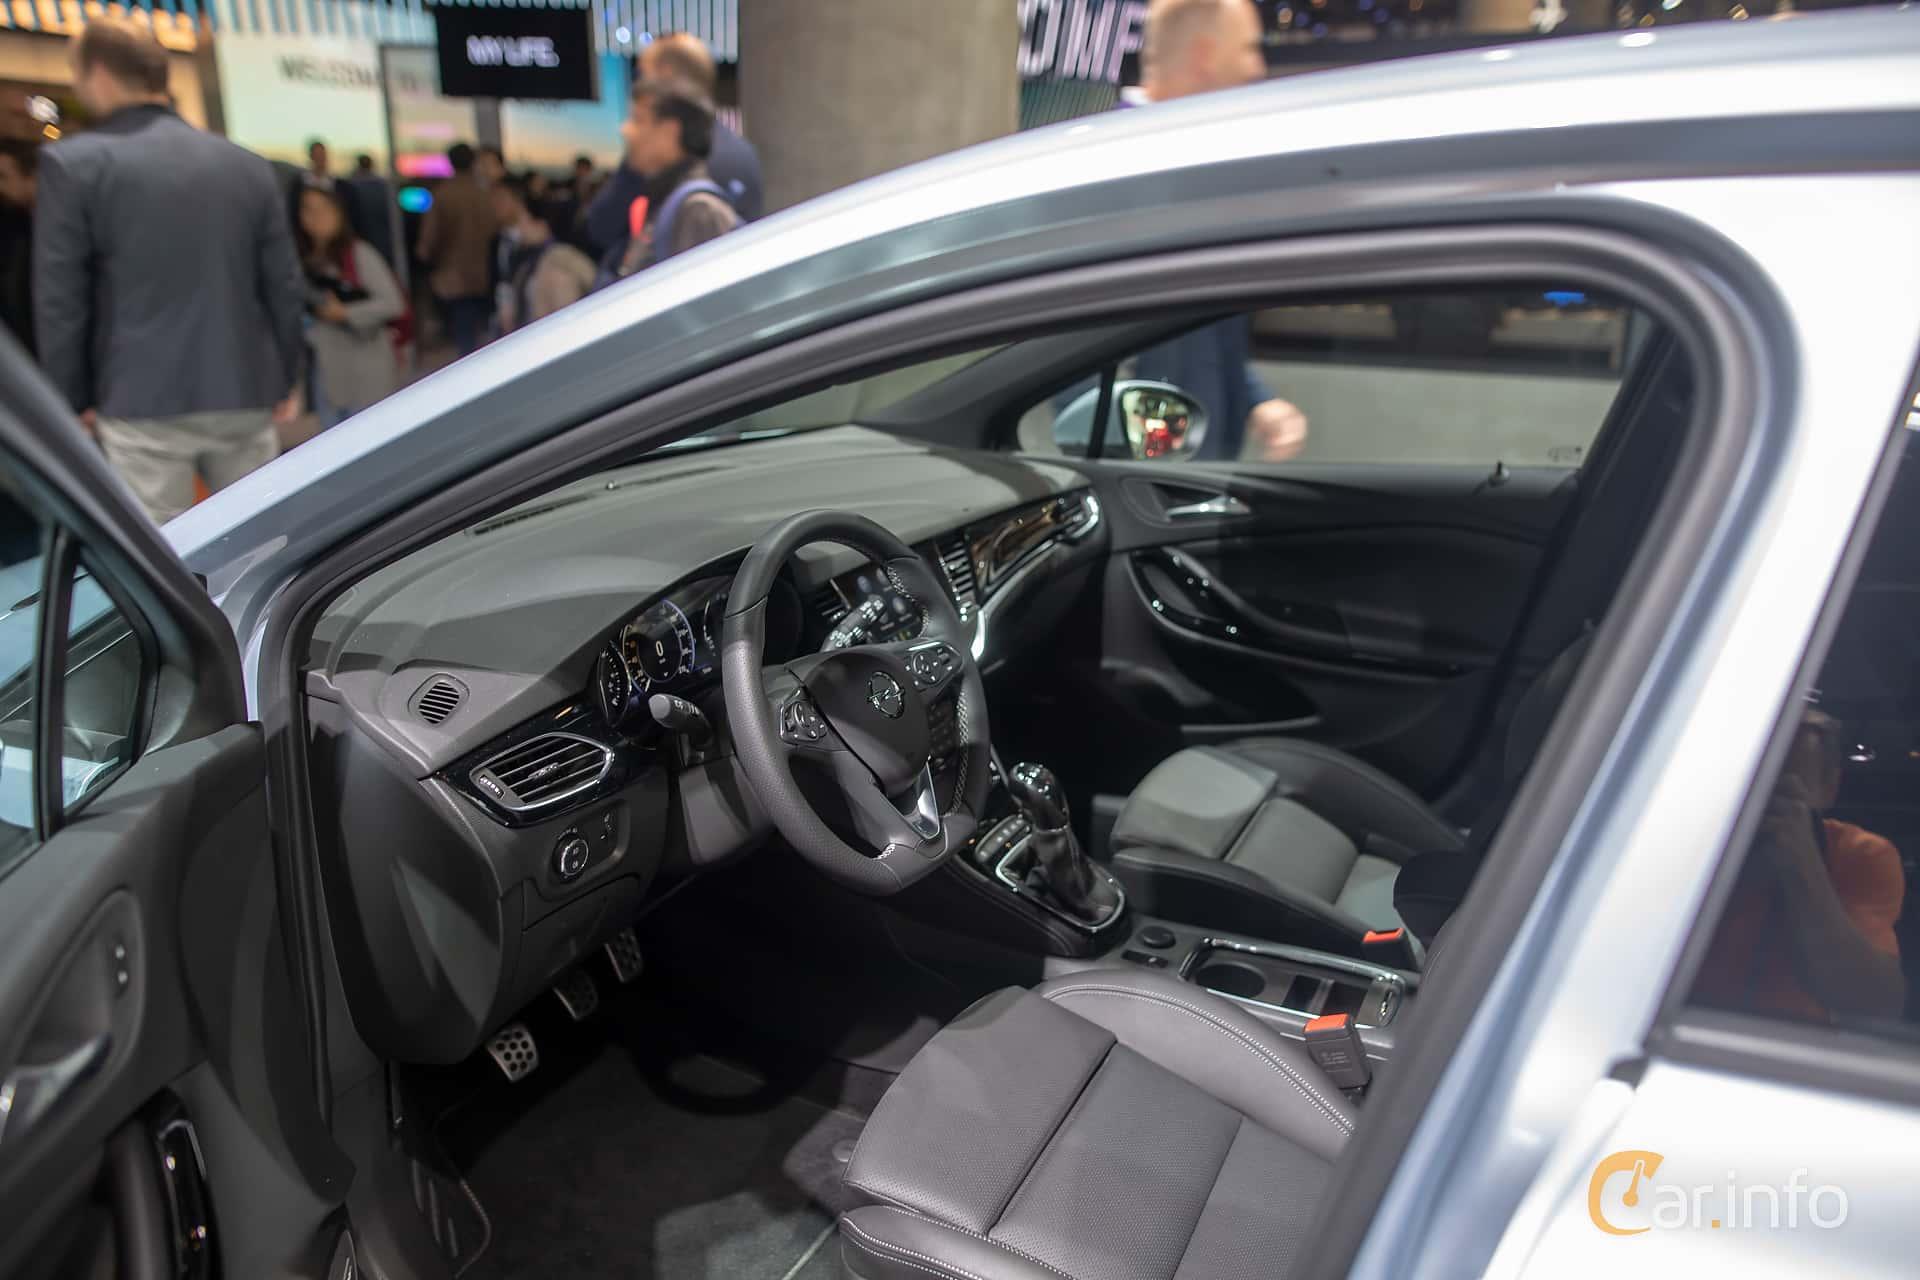 Opel Astra 1.2 Turbo Manual, 130hp, 2020 at IAA 2019